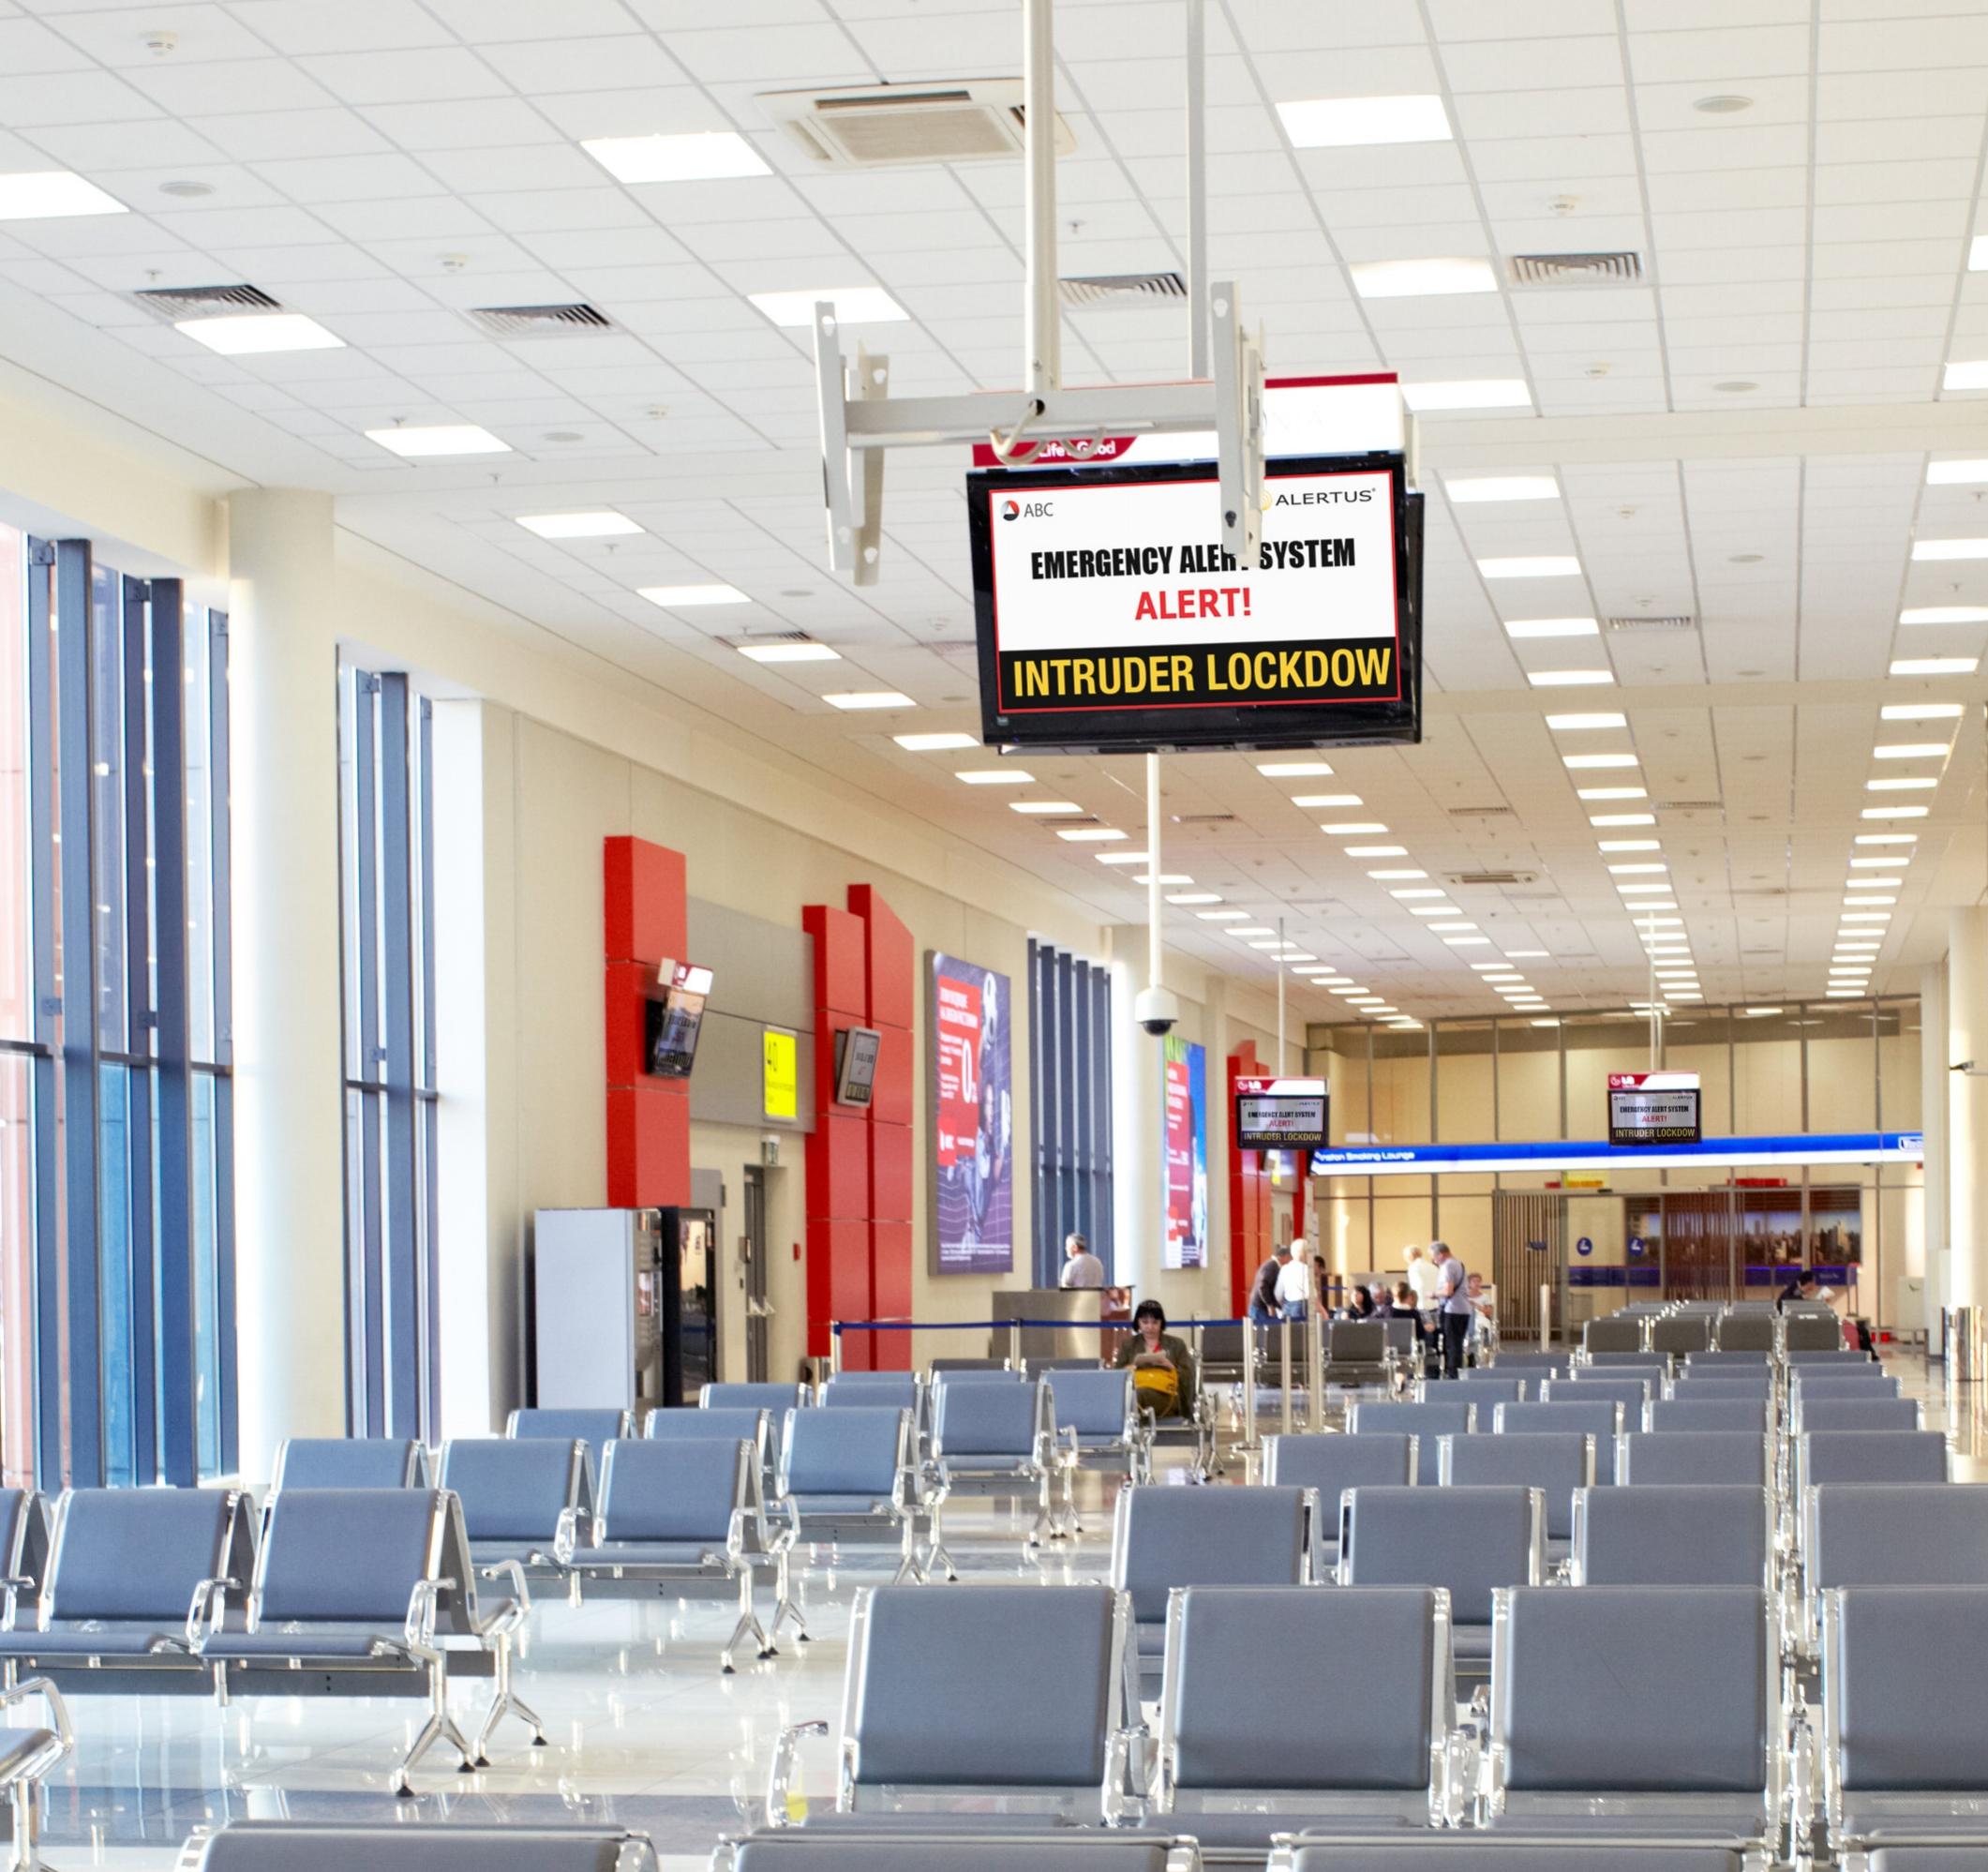 DM_03242016_0883_airport_digital_signage_high_res.jpg